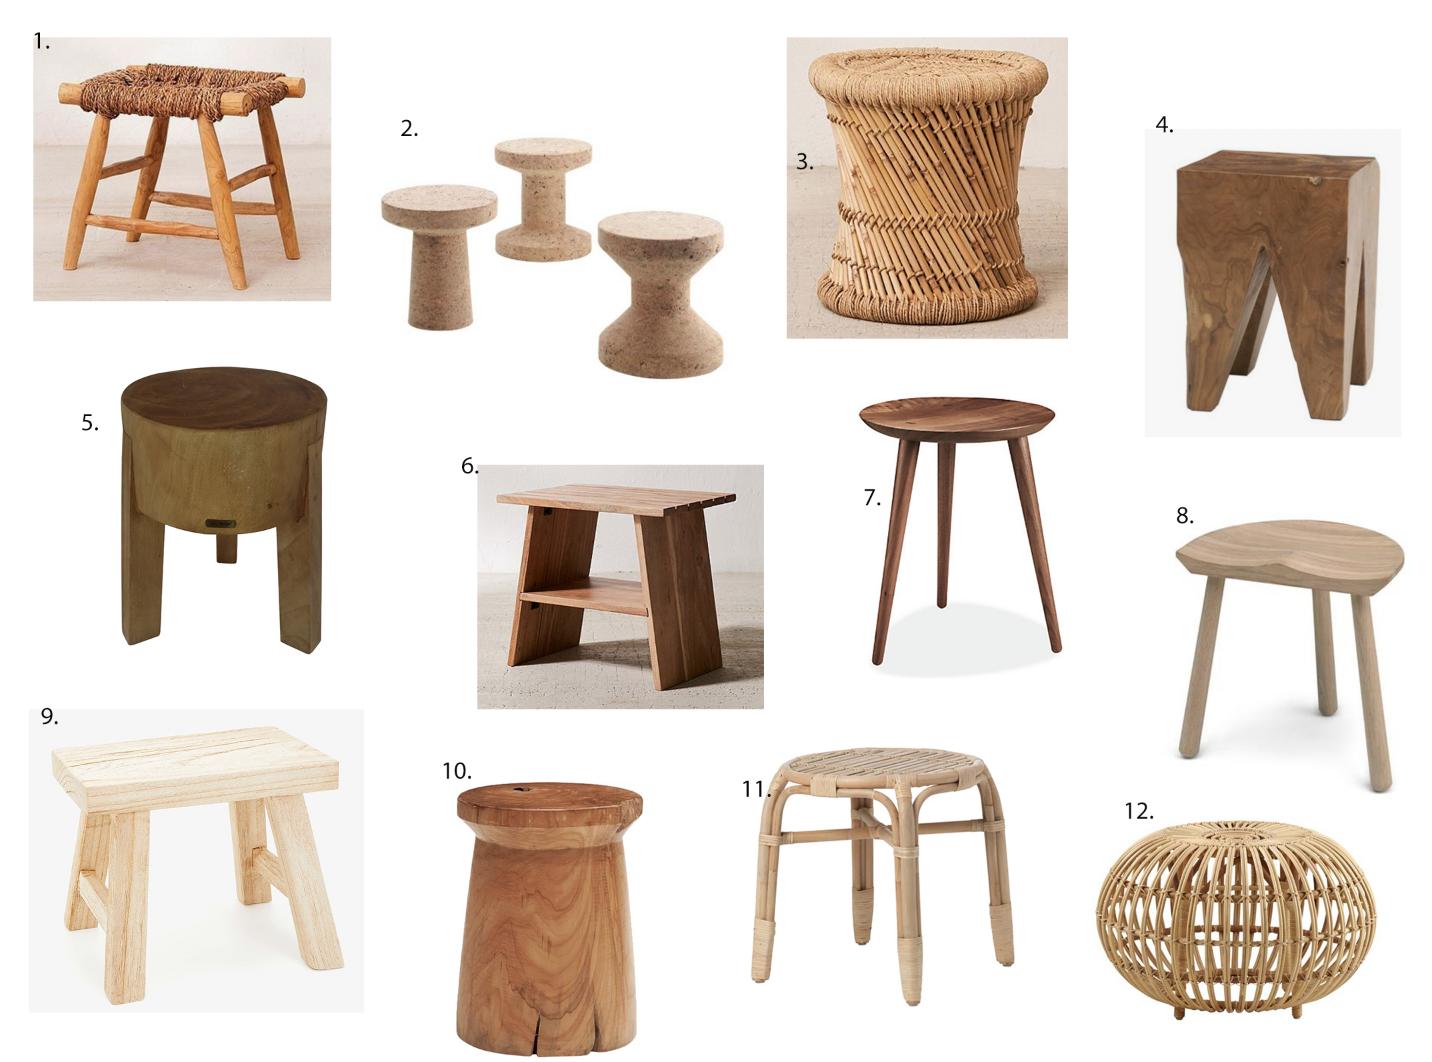 The Modhemian, modern bohemian bathroom stools